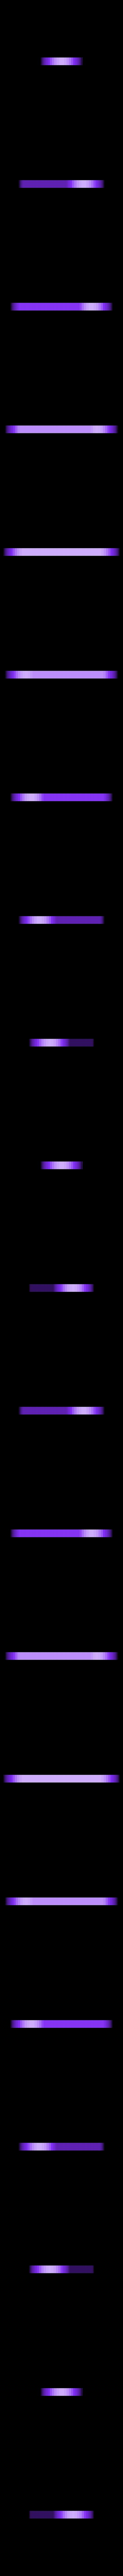 07.stl Download free STL file Shapers • 3D printer design, 3deran